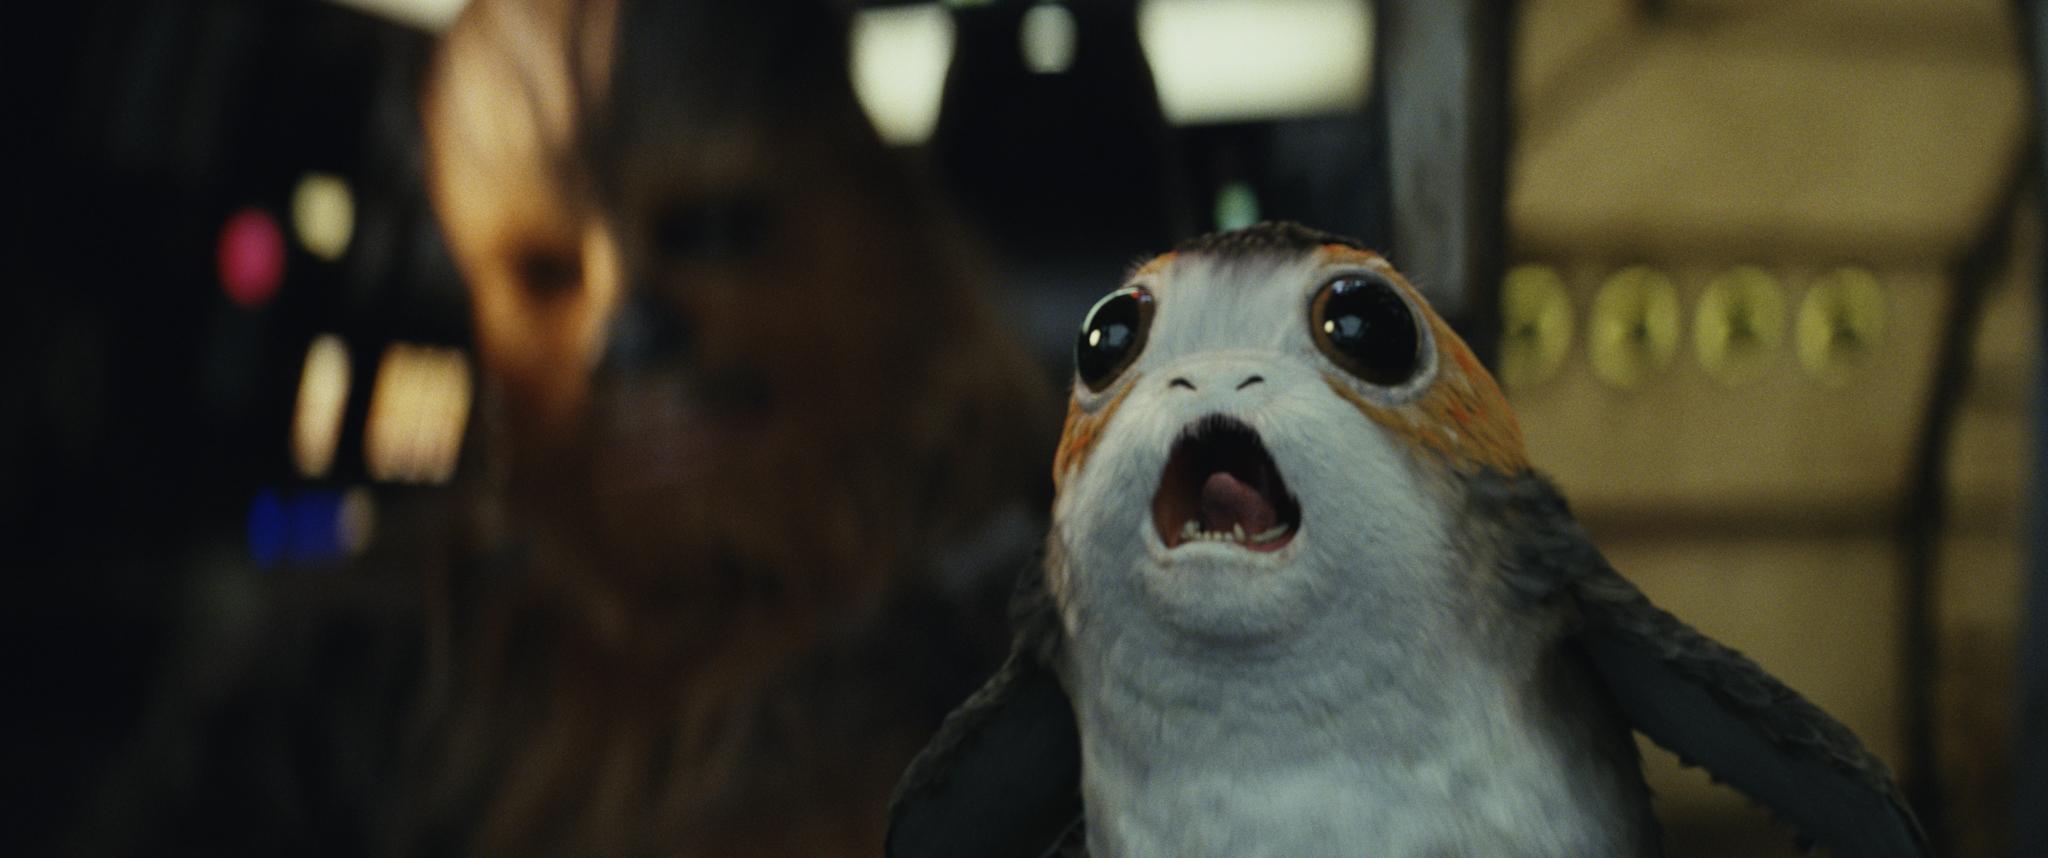 Star Wars: The Last Jedi Review, The Last Jedi Review, The Last Jedi, Star Wars Movie 2017